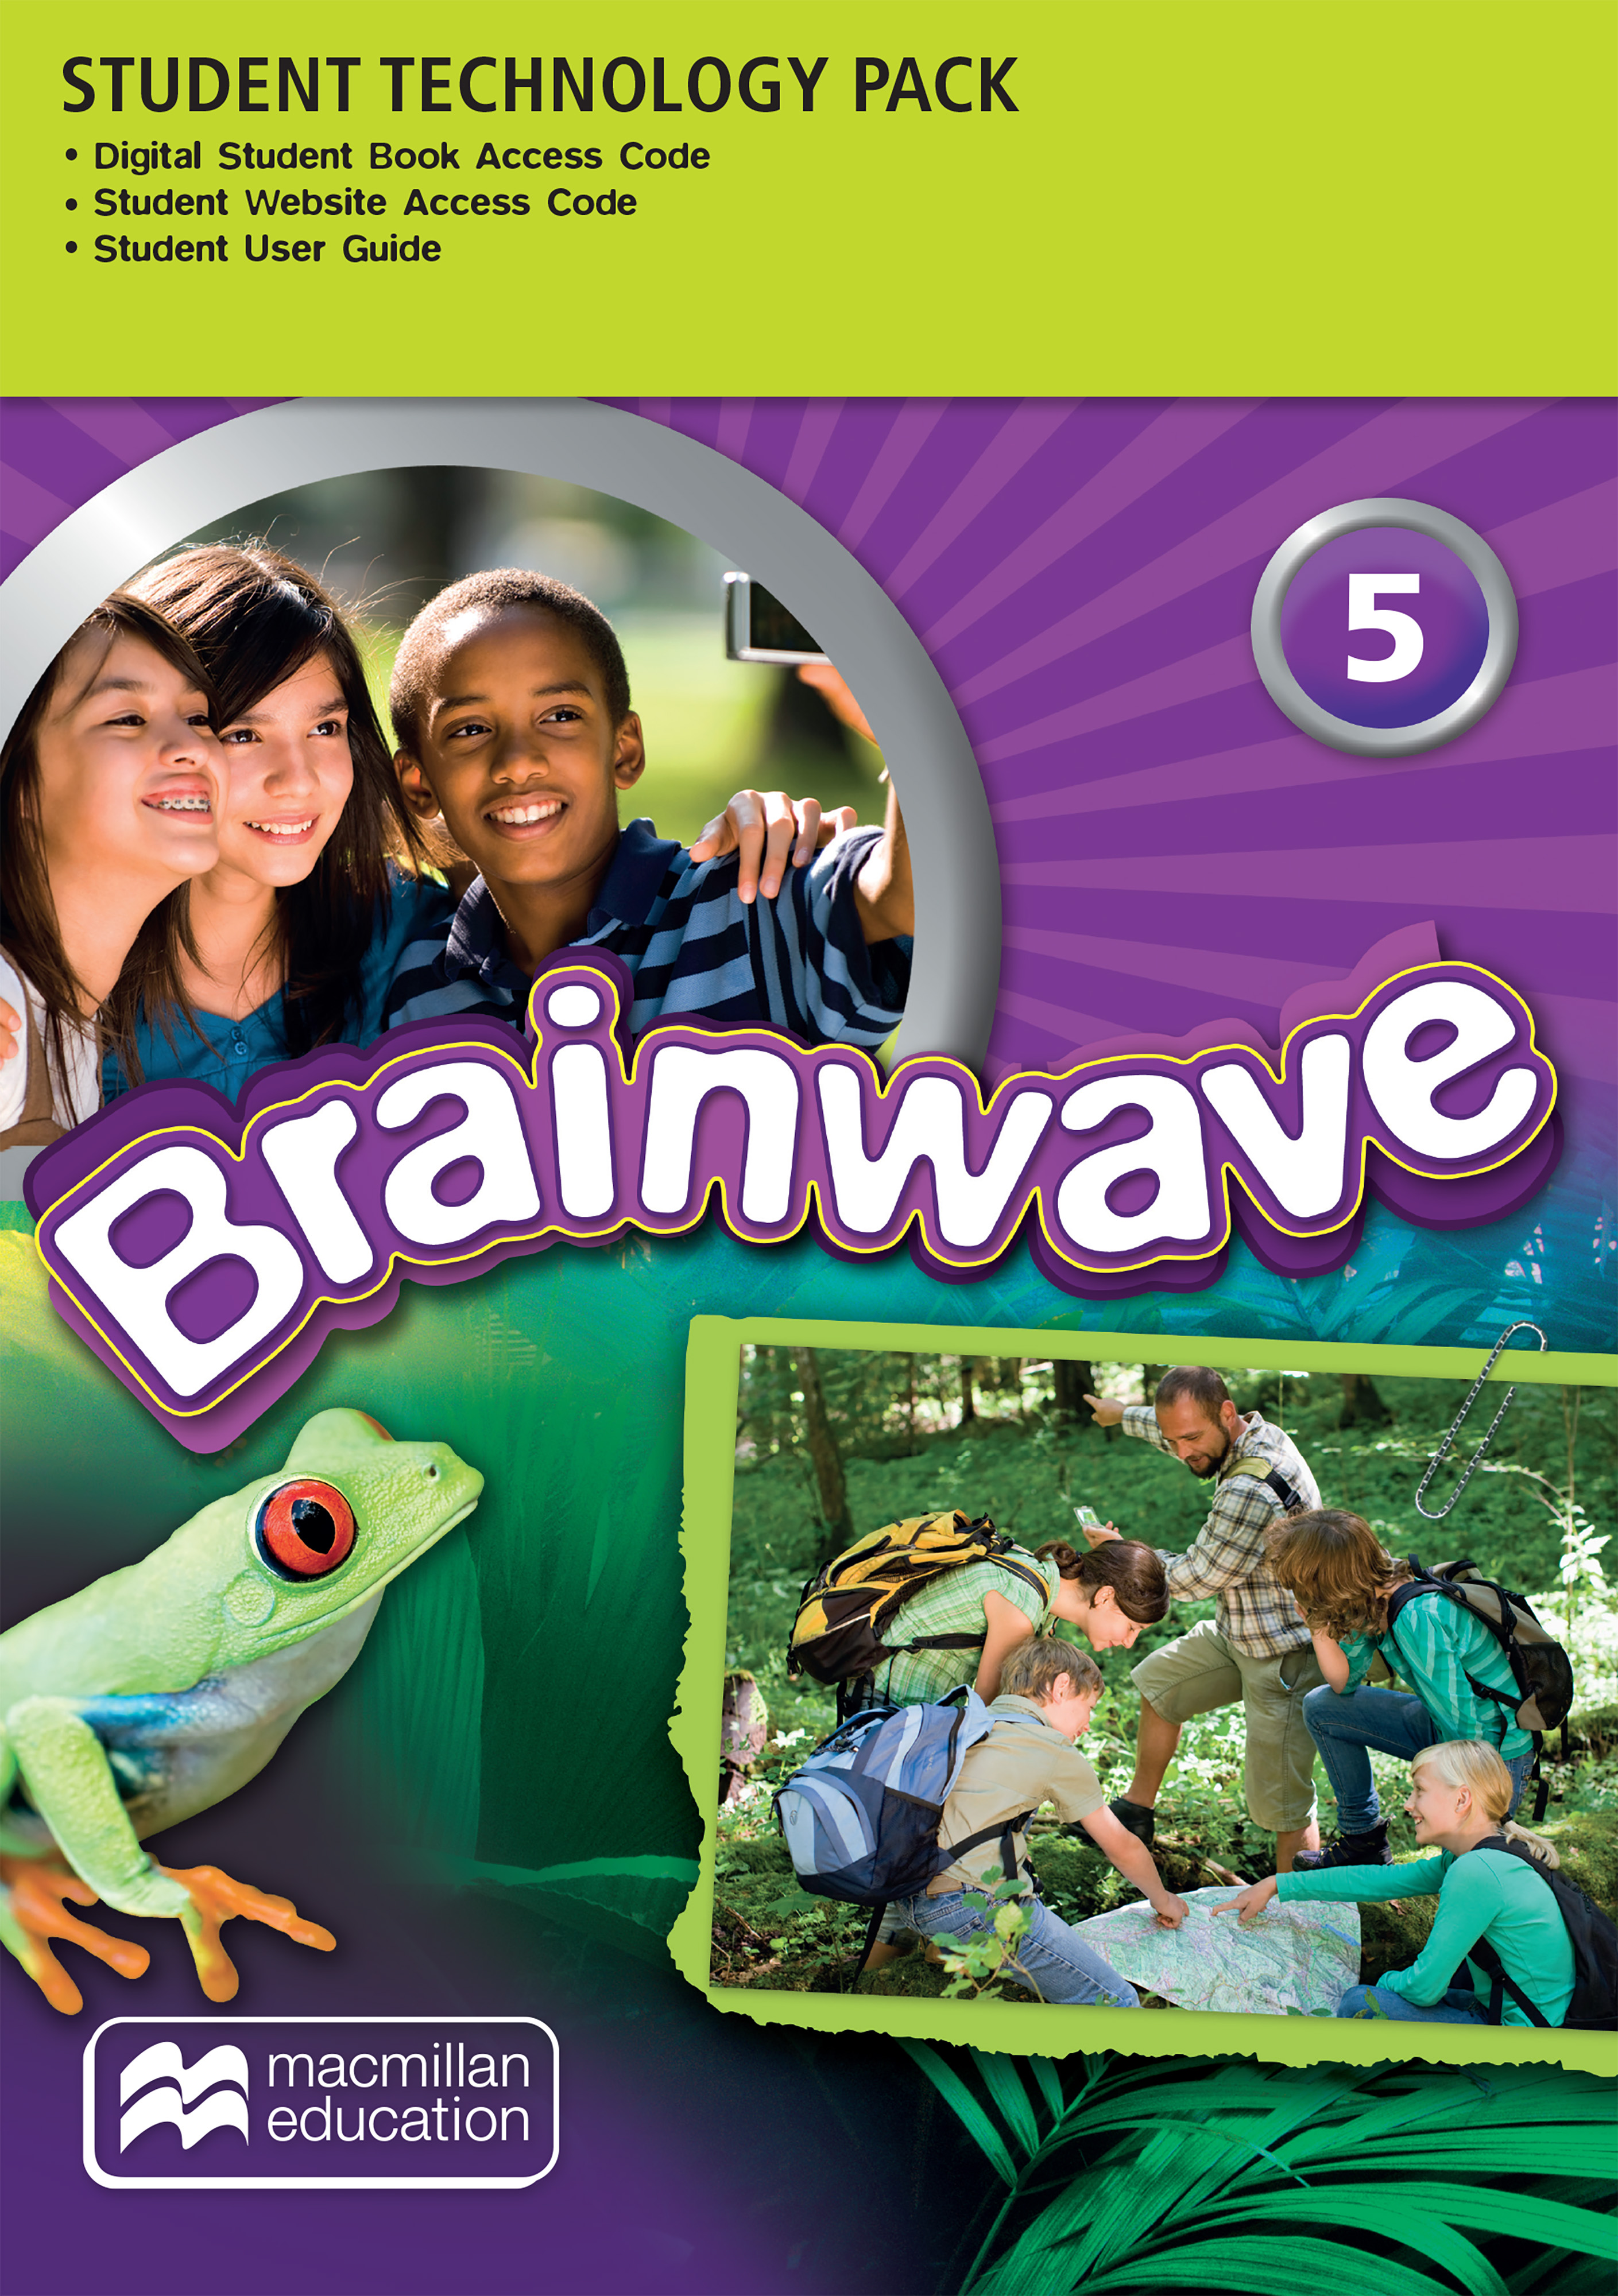 Brainwave 5 Student Technology Pack